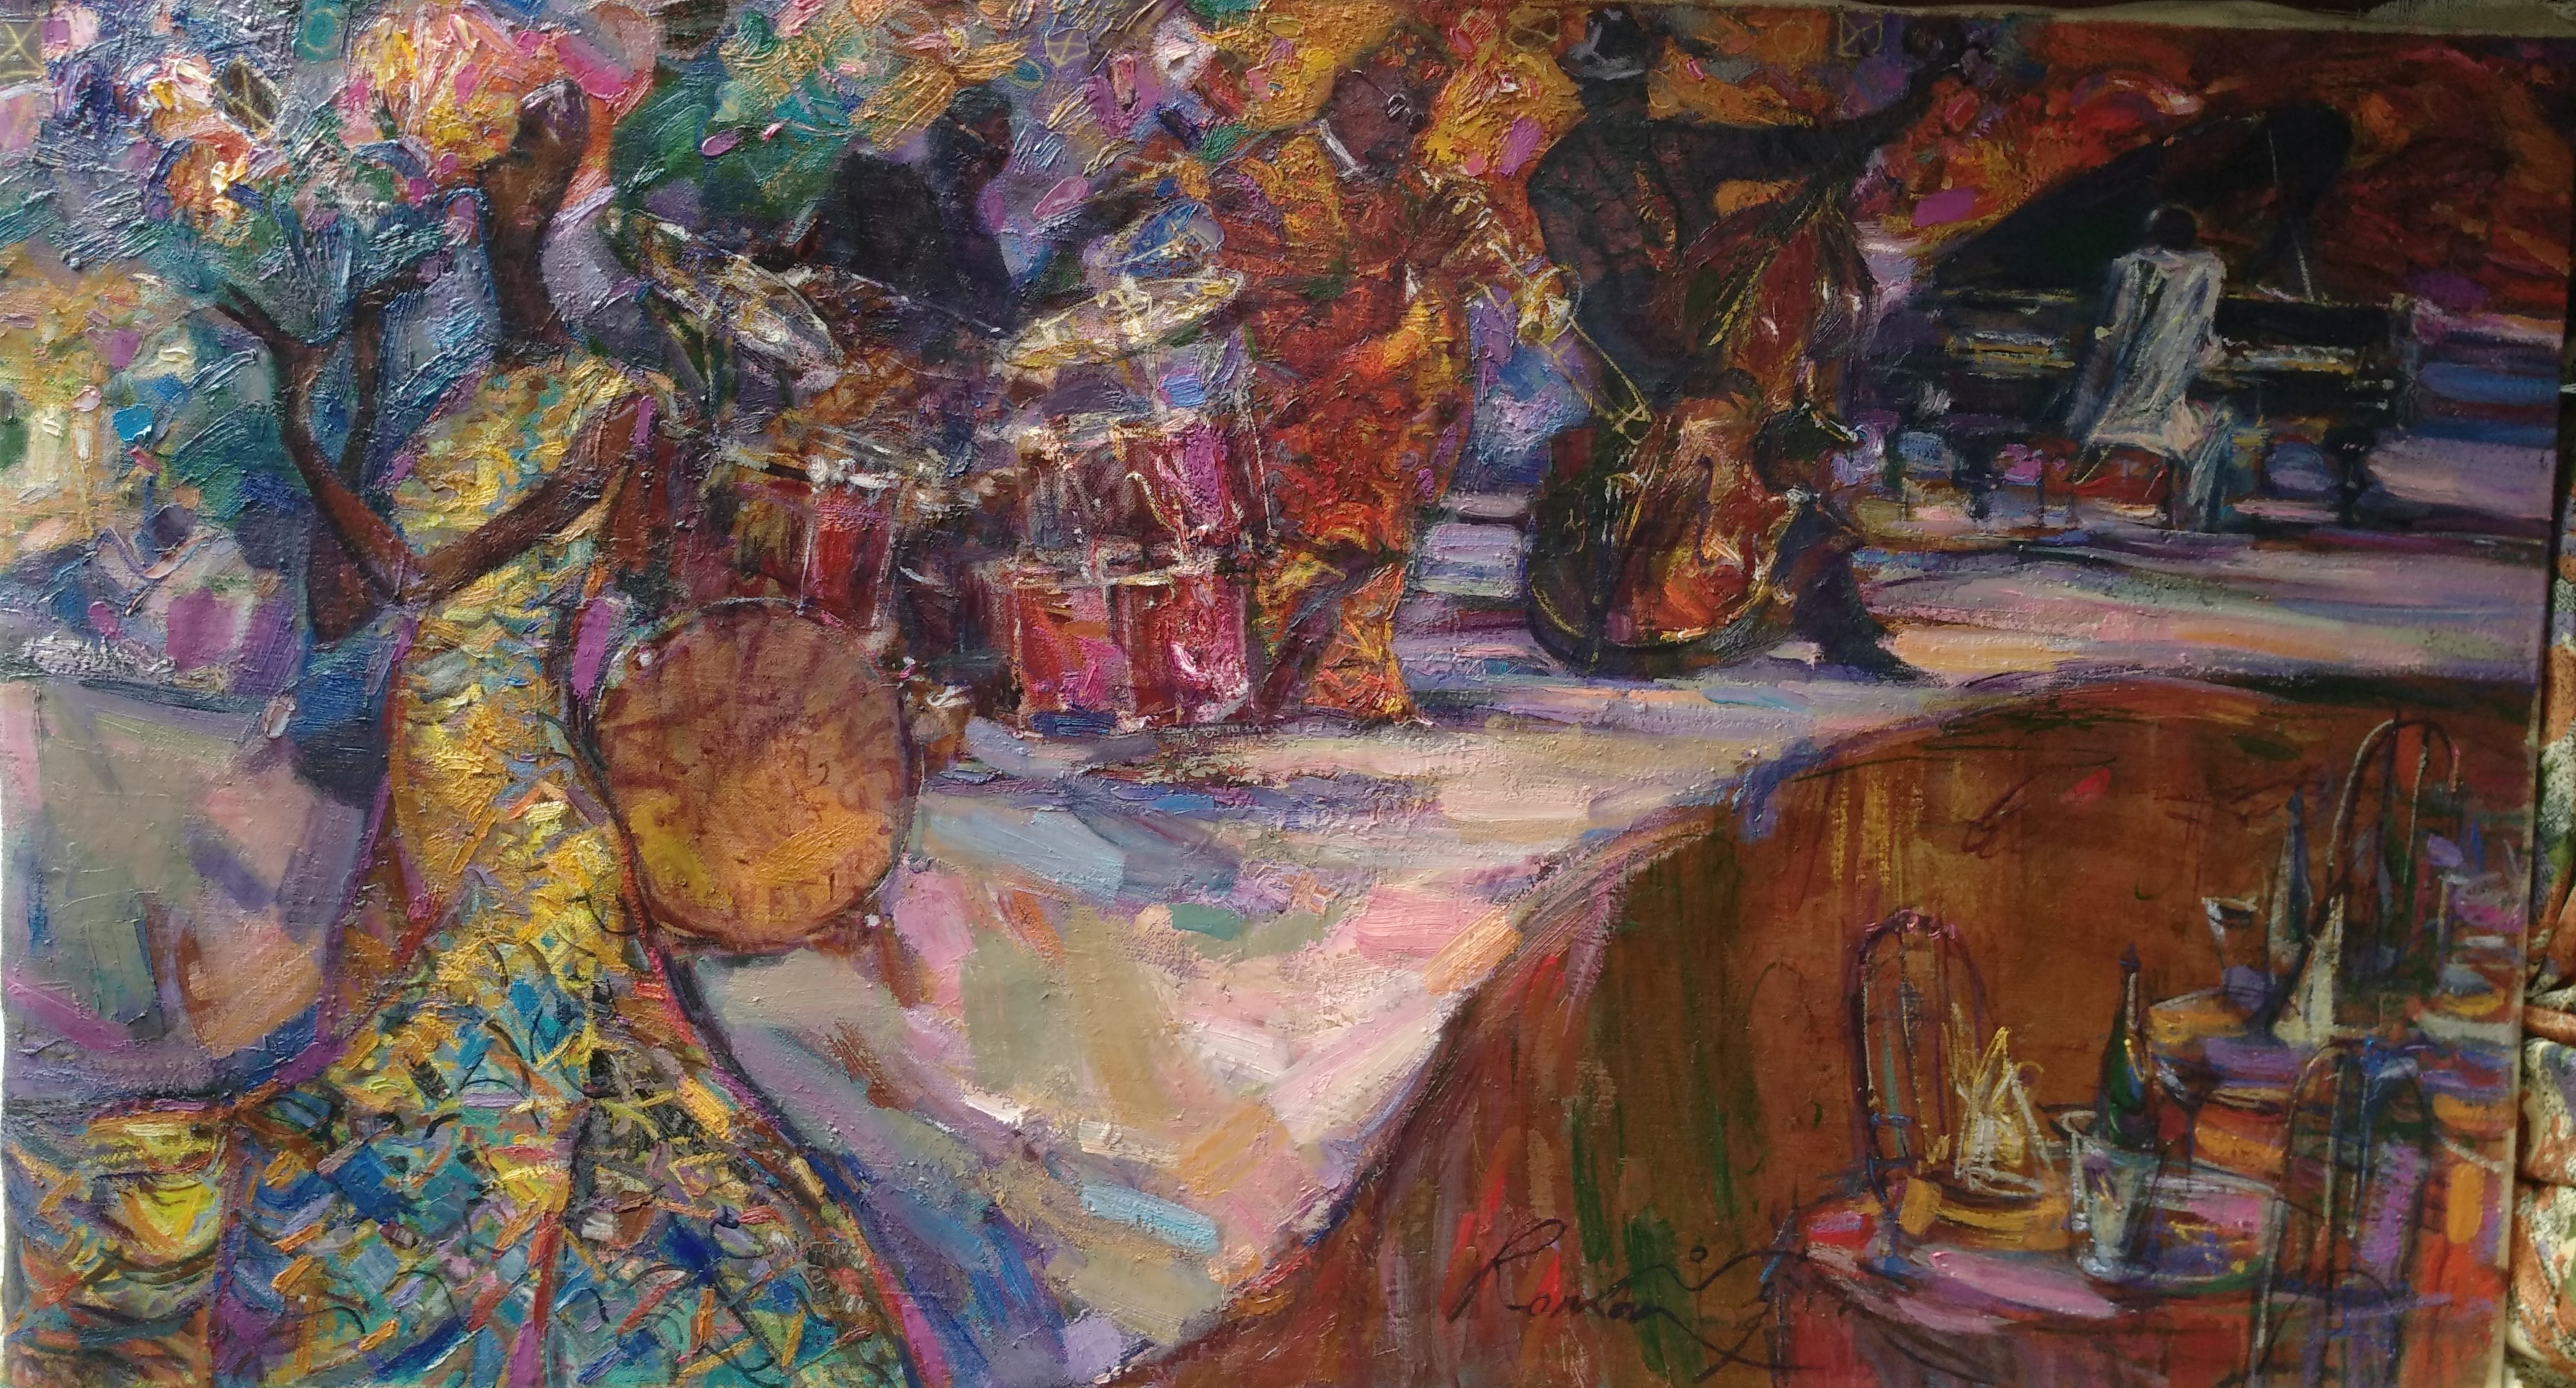 OLD BLUES. FOLLOWERS. oil on canvas, artist ROMAN NOGIN